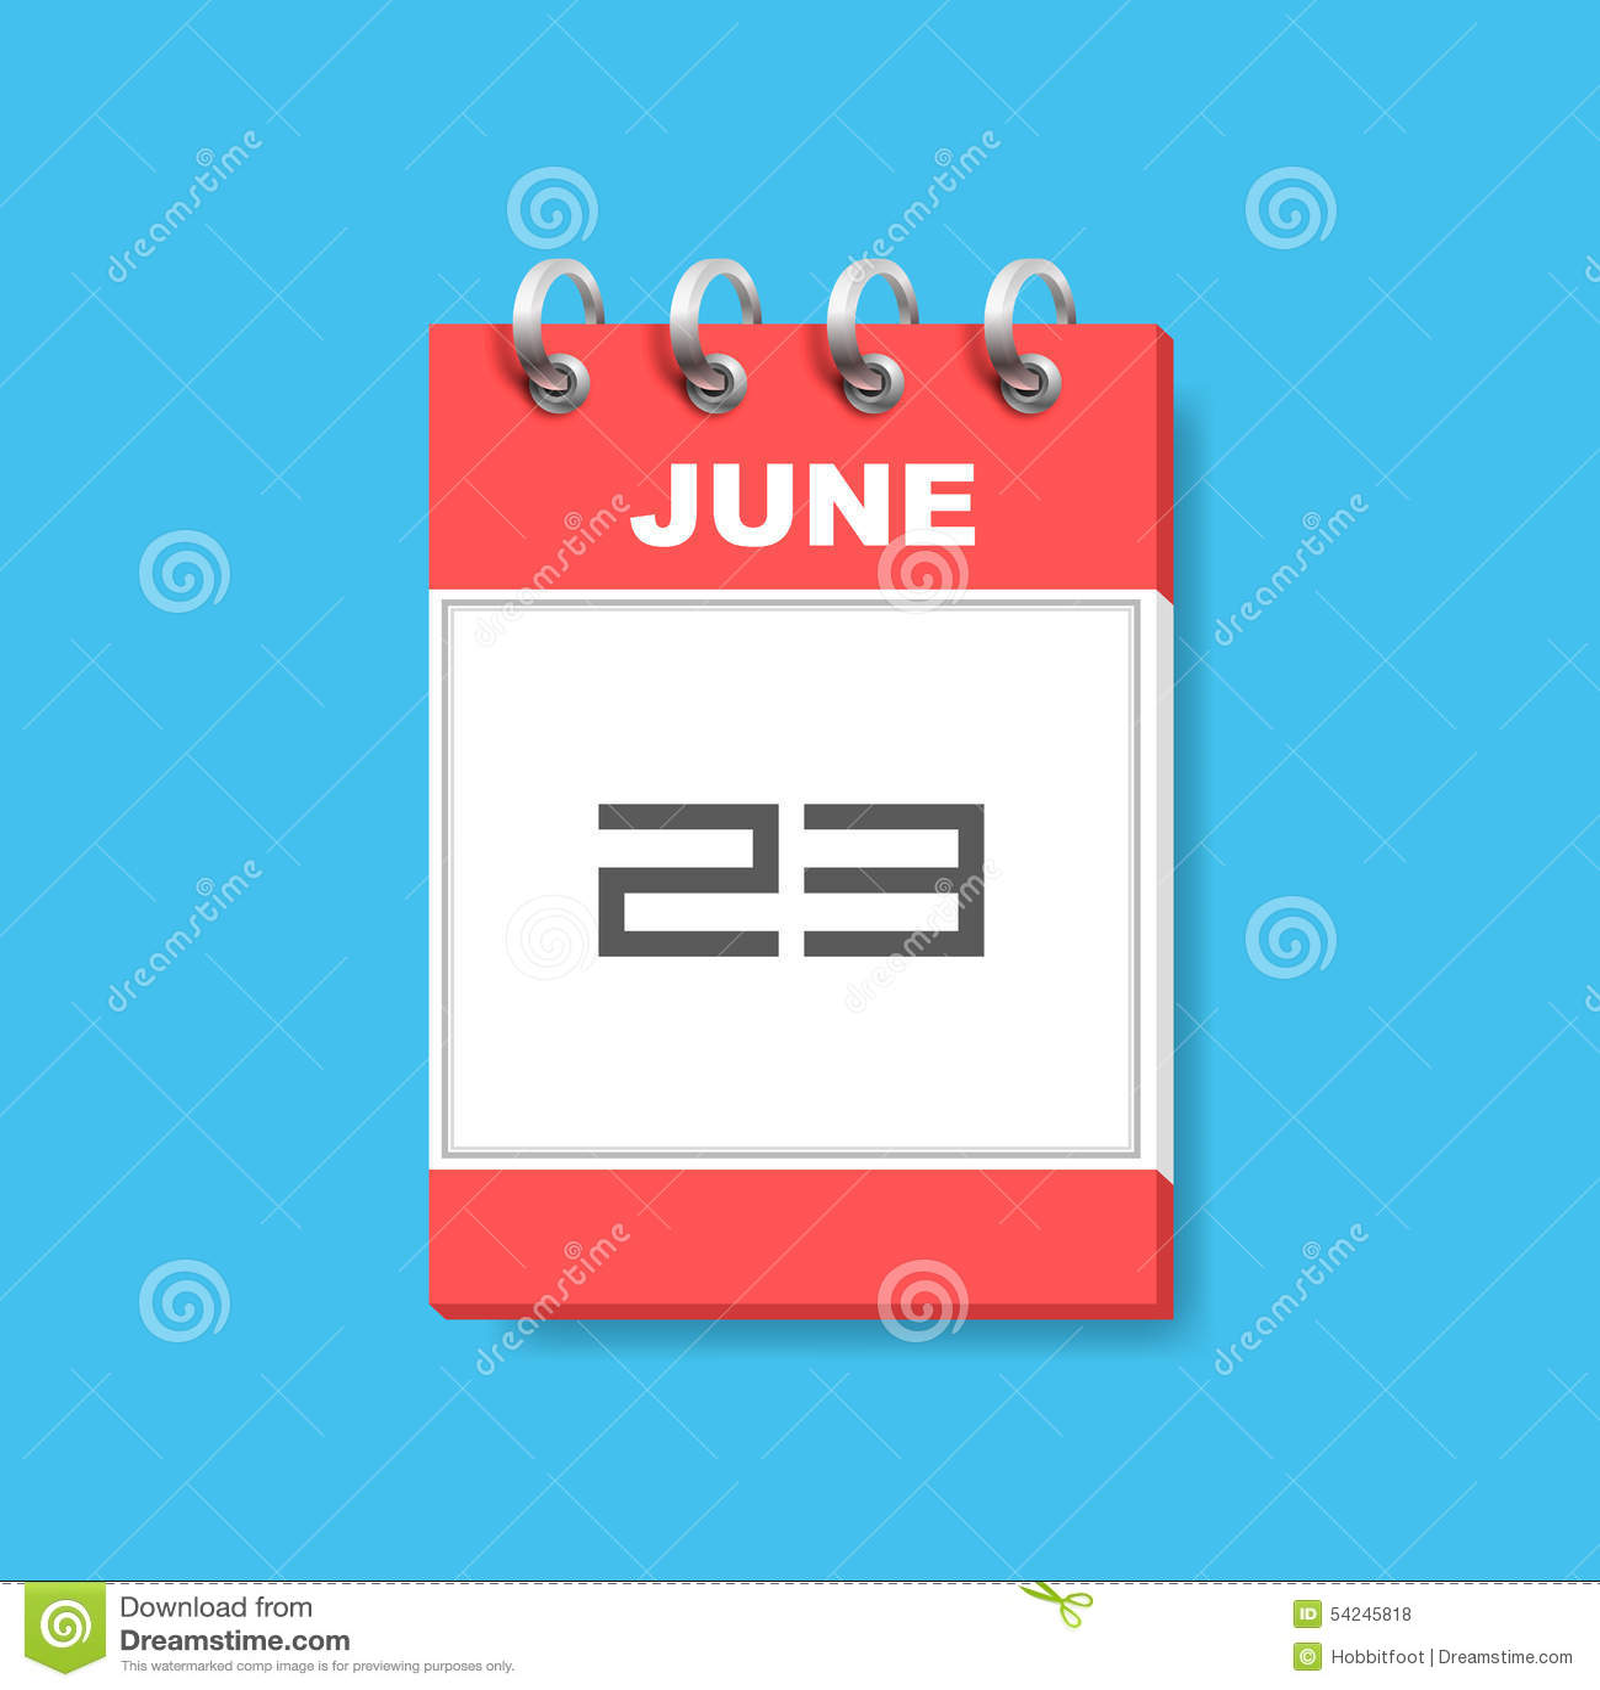 Calendar Flat Illustration : Calendar icon flat art stock vector image